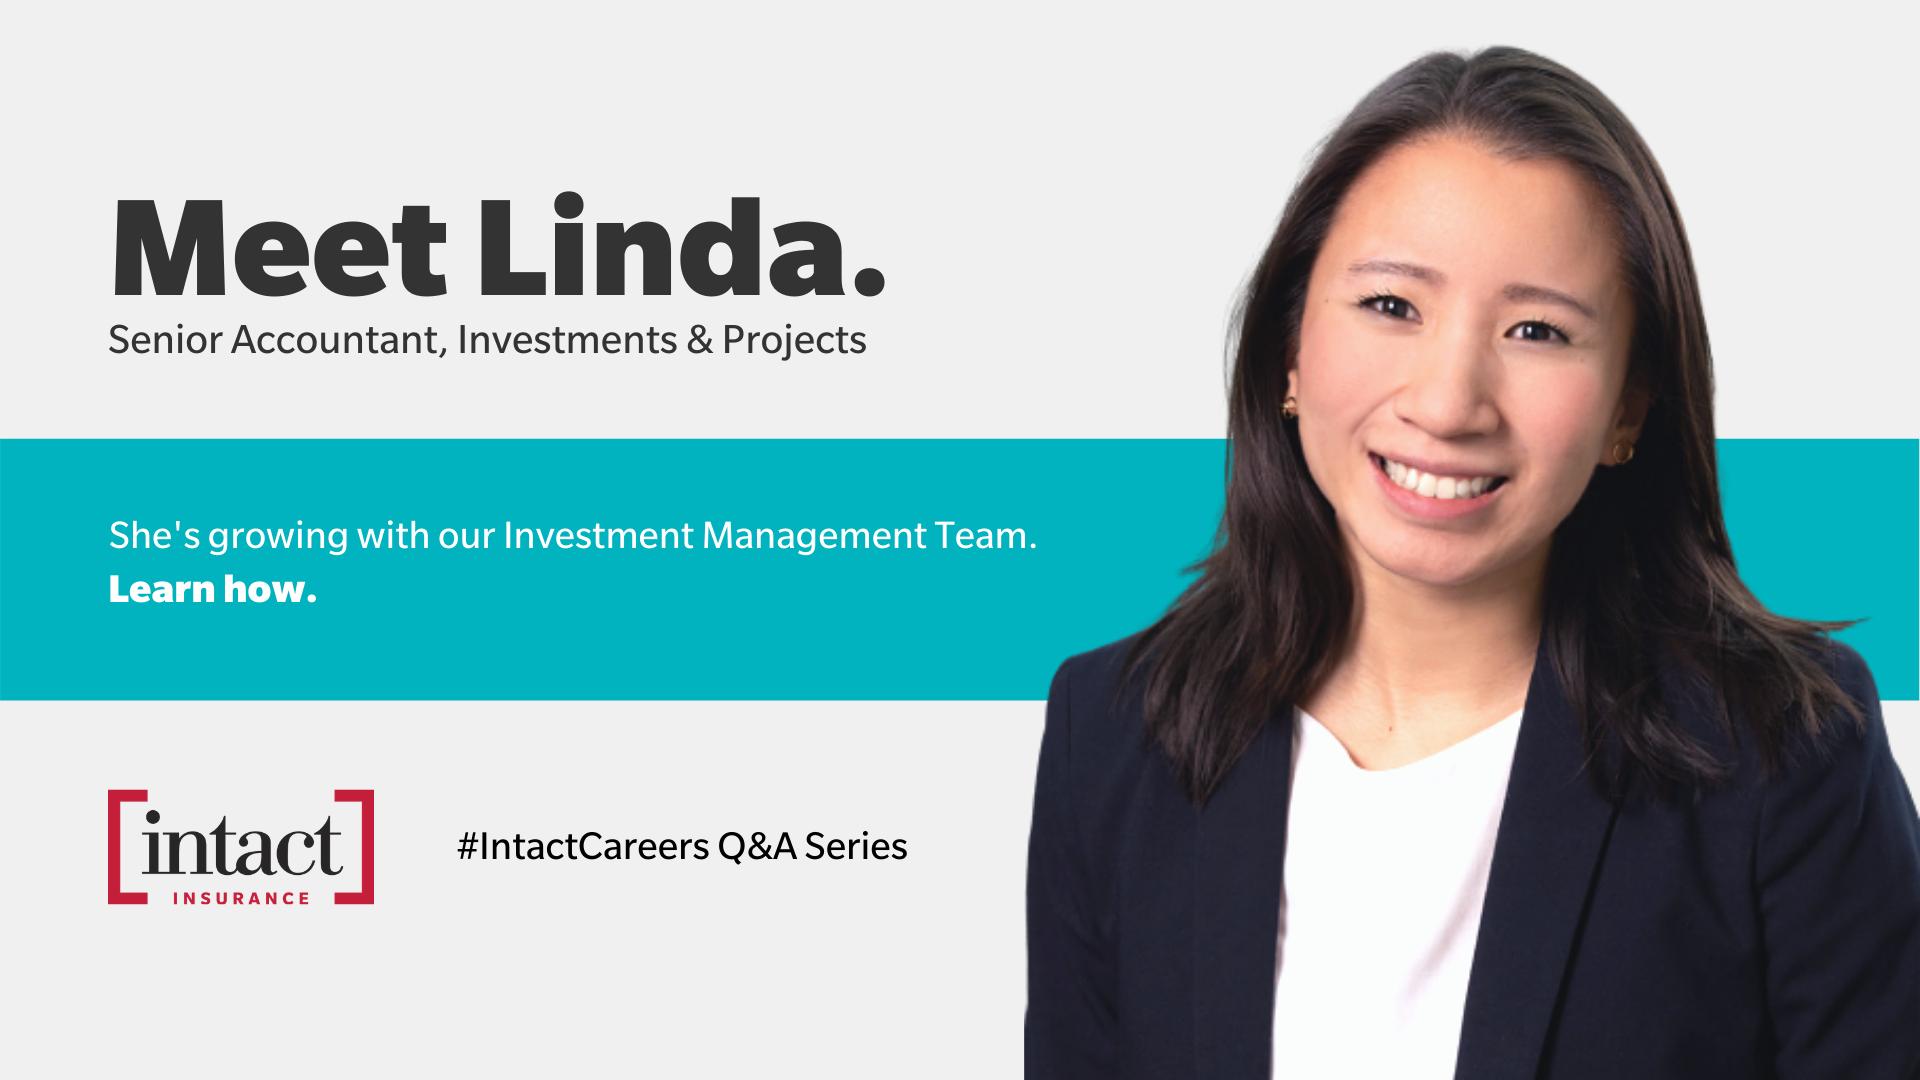 Meet Linda - Intact Careers Q&A Series